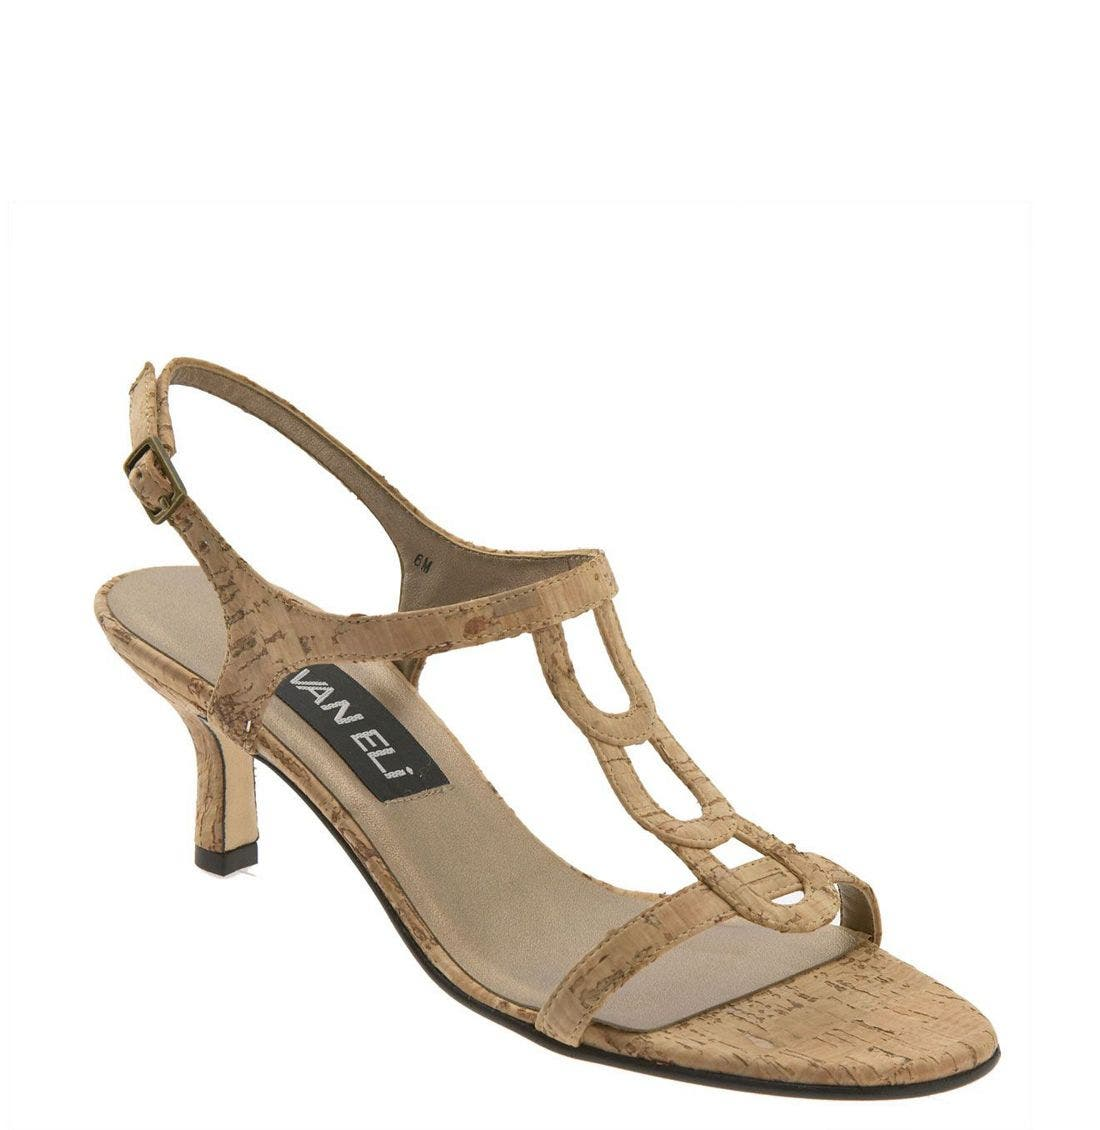 Alternate Image 1 Selected - VANELi 'Mirelys' Cork Sandal